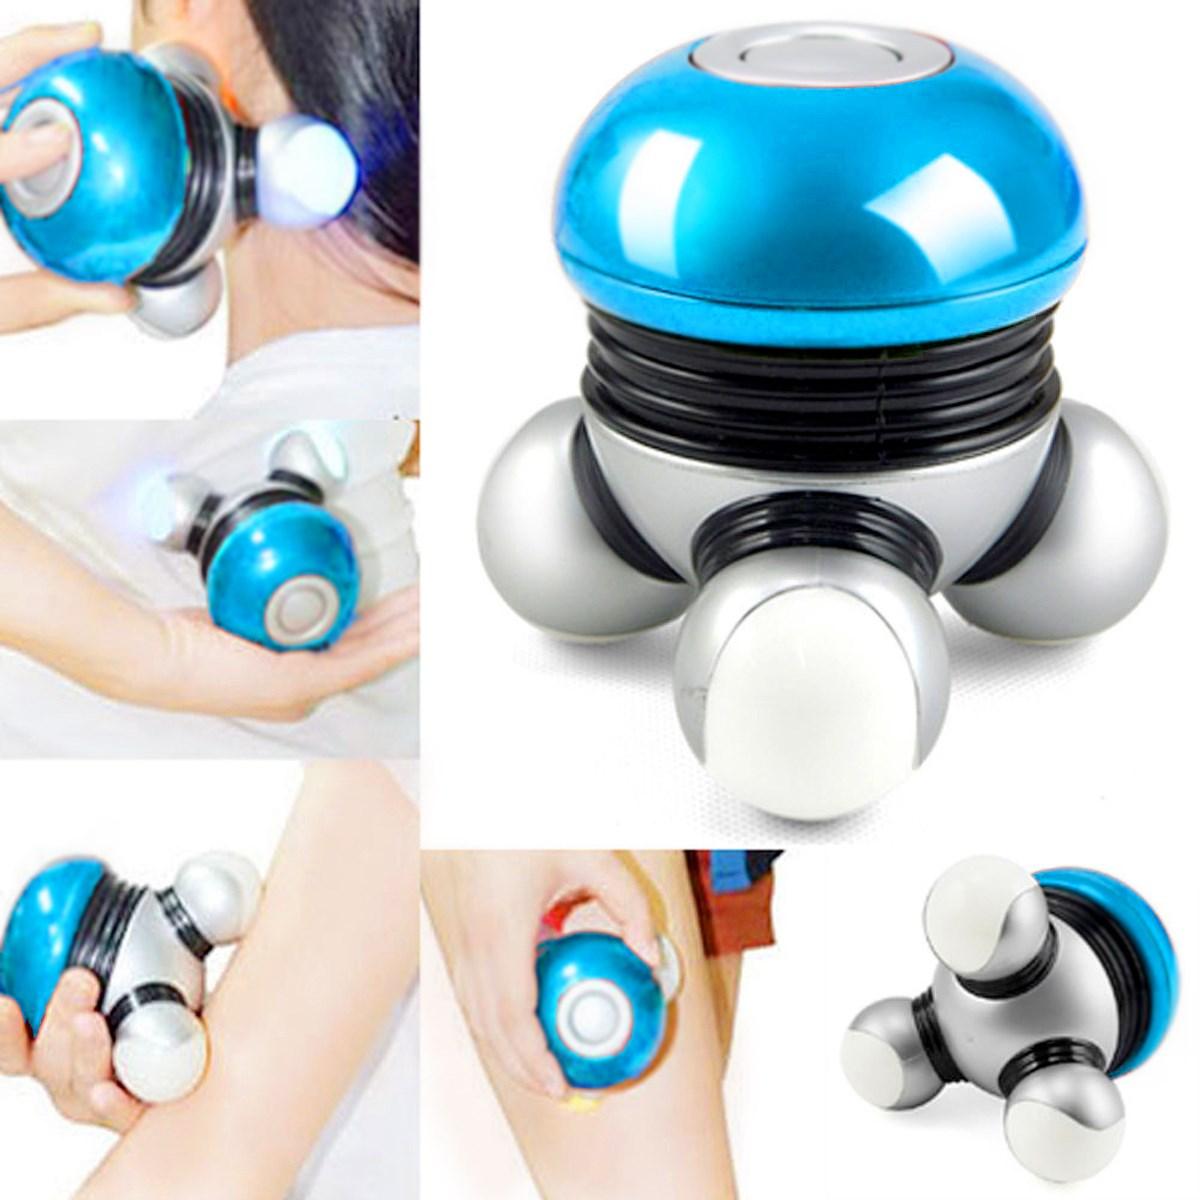 Portable Blue Hotsale Bodysecrets Mini Colorful Hand Held Vibrating Full Body Massage Roller Power Ball Instrument(China (Mainland))